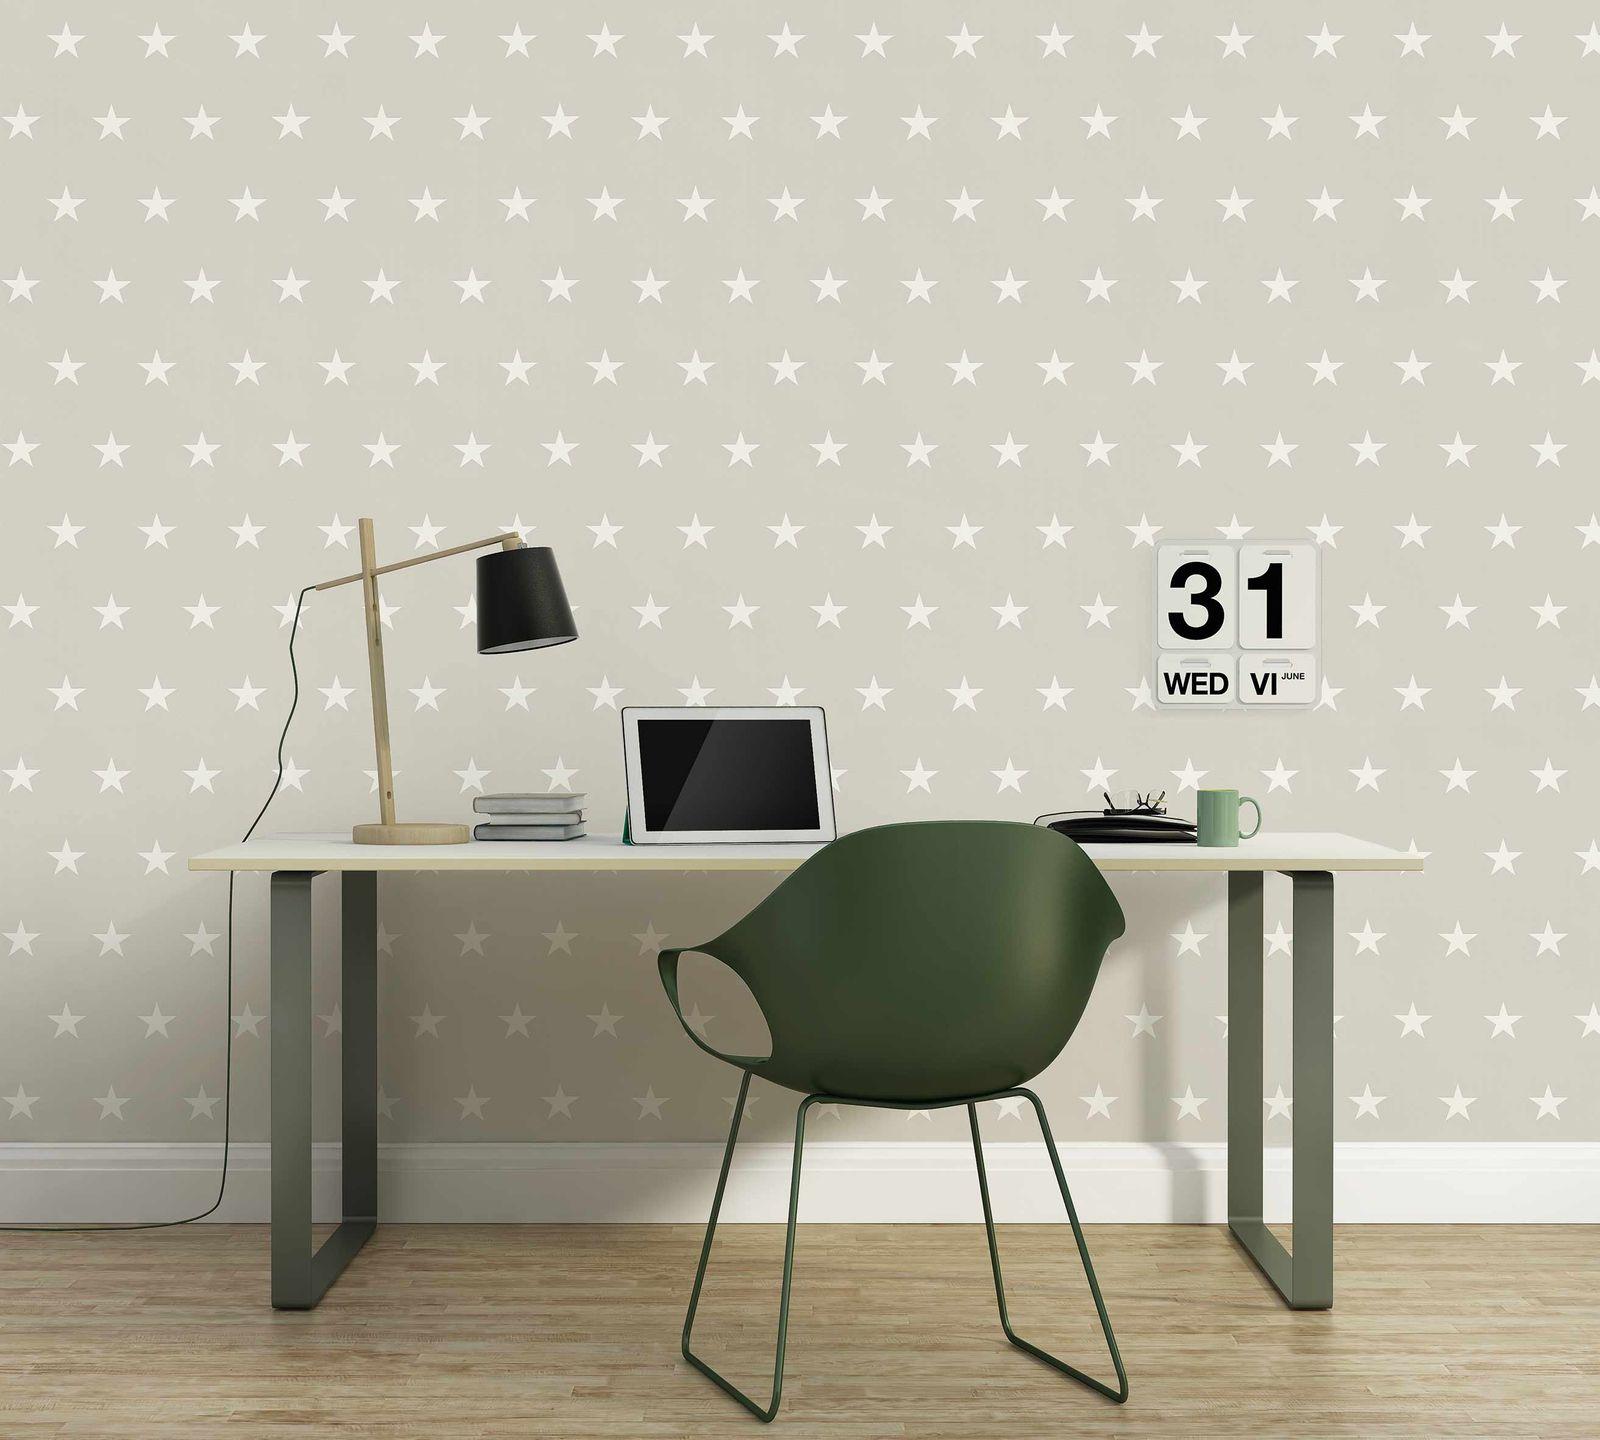 vliestapete sterne sterntapete tapete stern muster. Black Bedroom Furniture Sets. Home Design Ideas